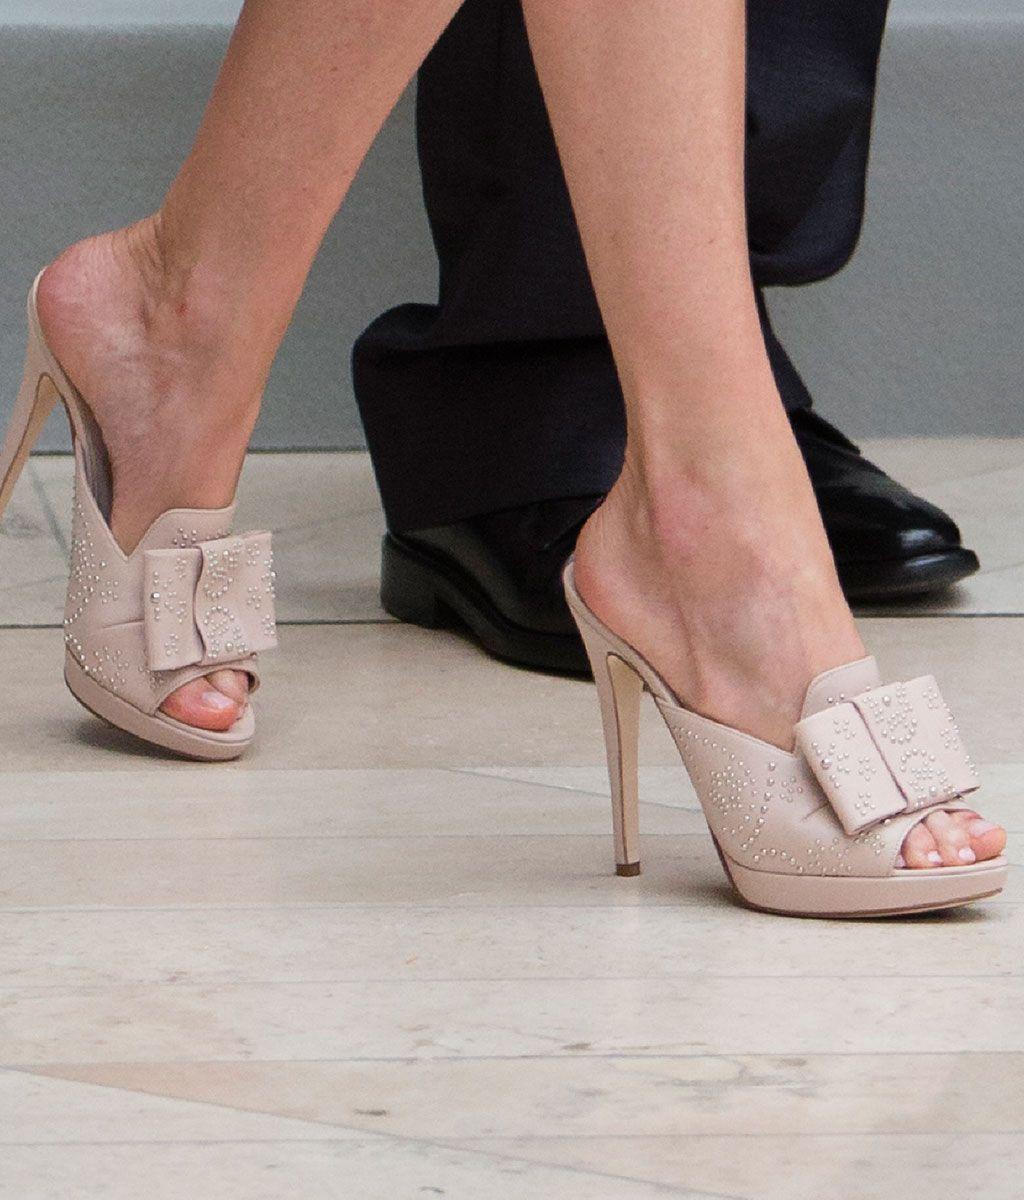 a8c370d50123 A los pies de Letizia Ortiz… ¡tacón de aguja!